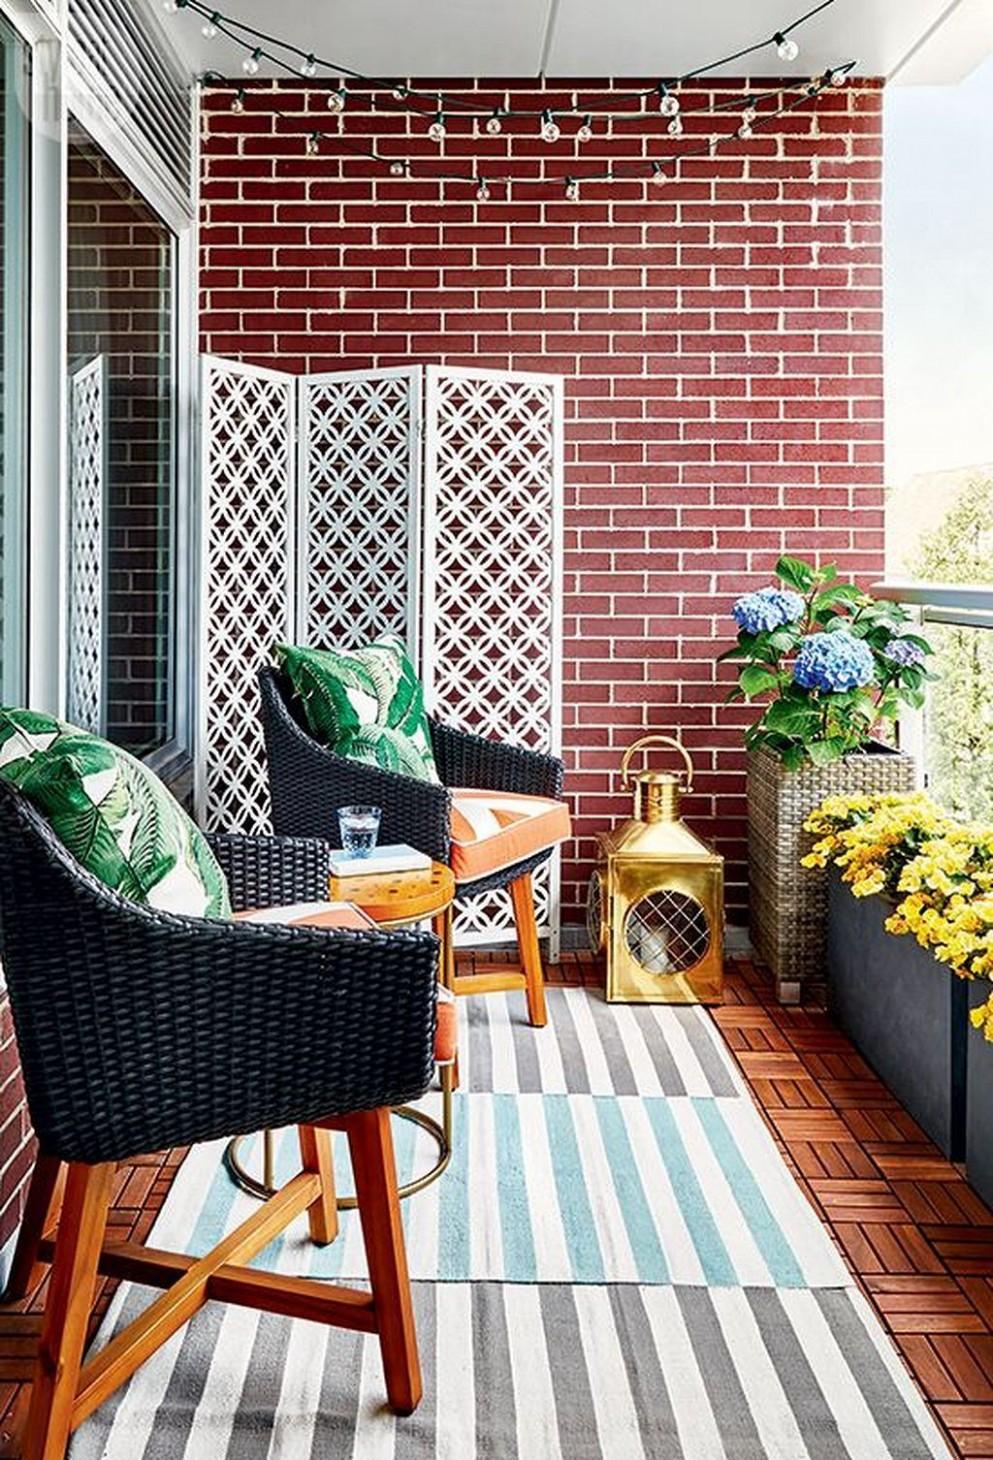 Small Apartment Balcony Decor Ideas On A Budget (12)  Balcony  - Apartment Balcony Ideas On A Budget